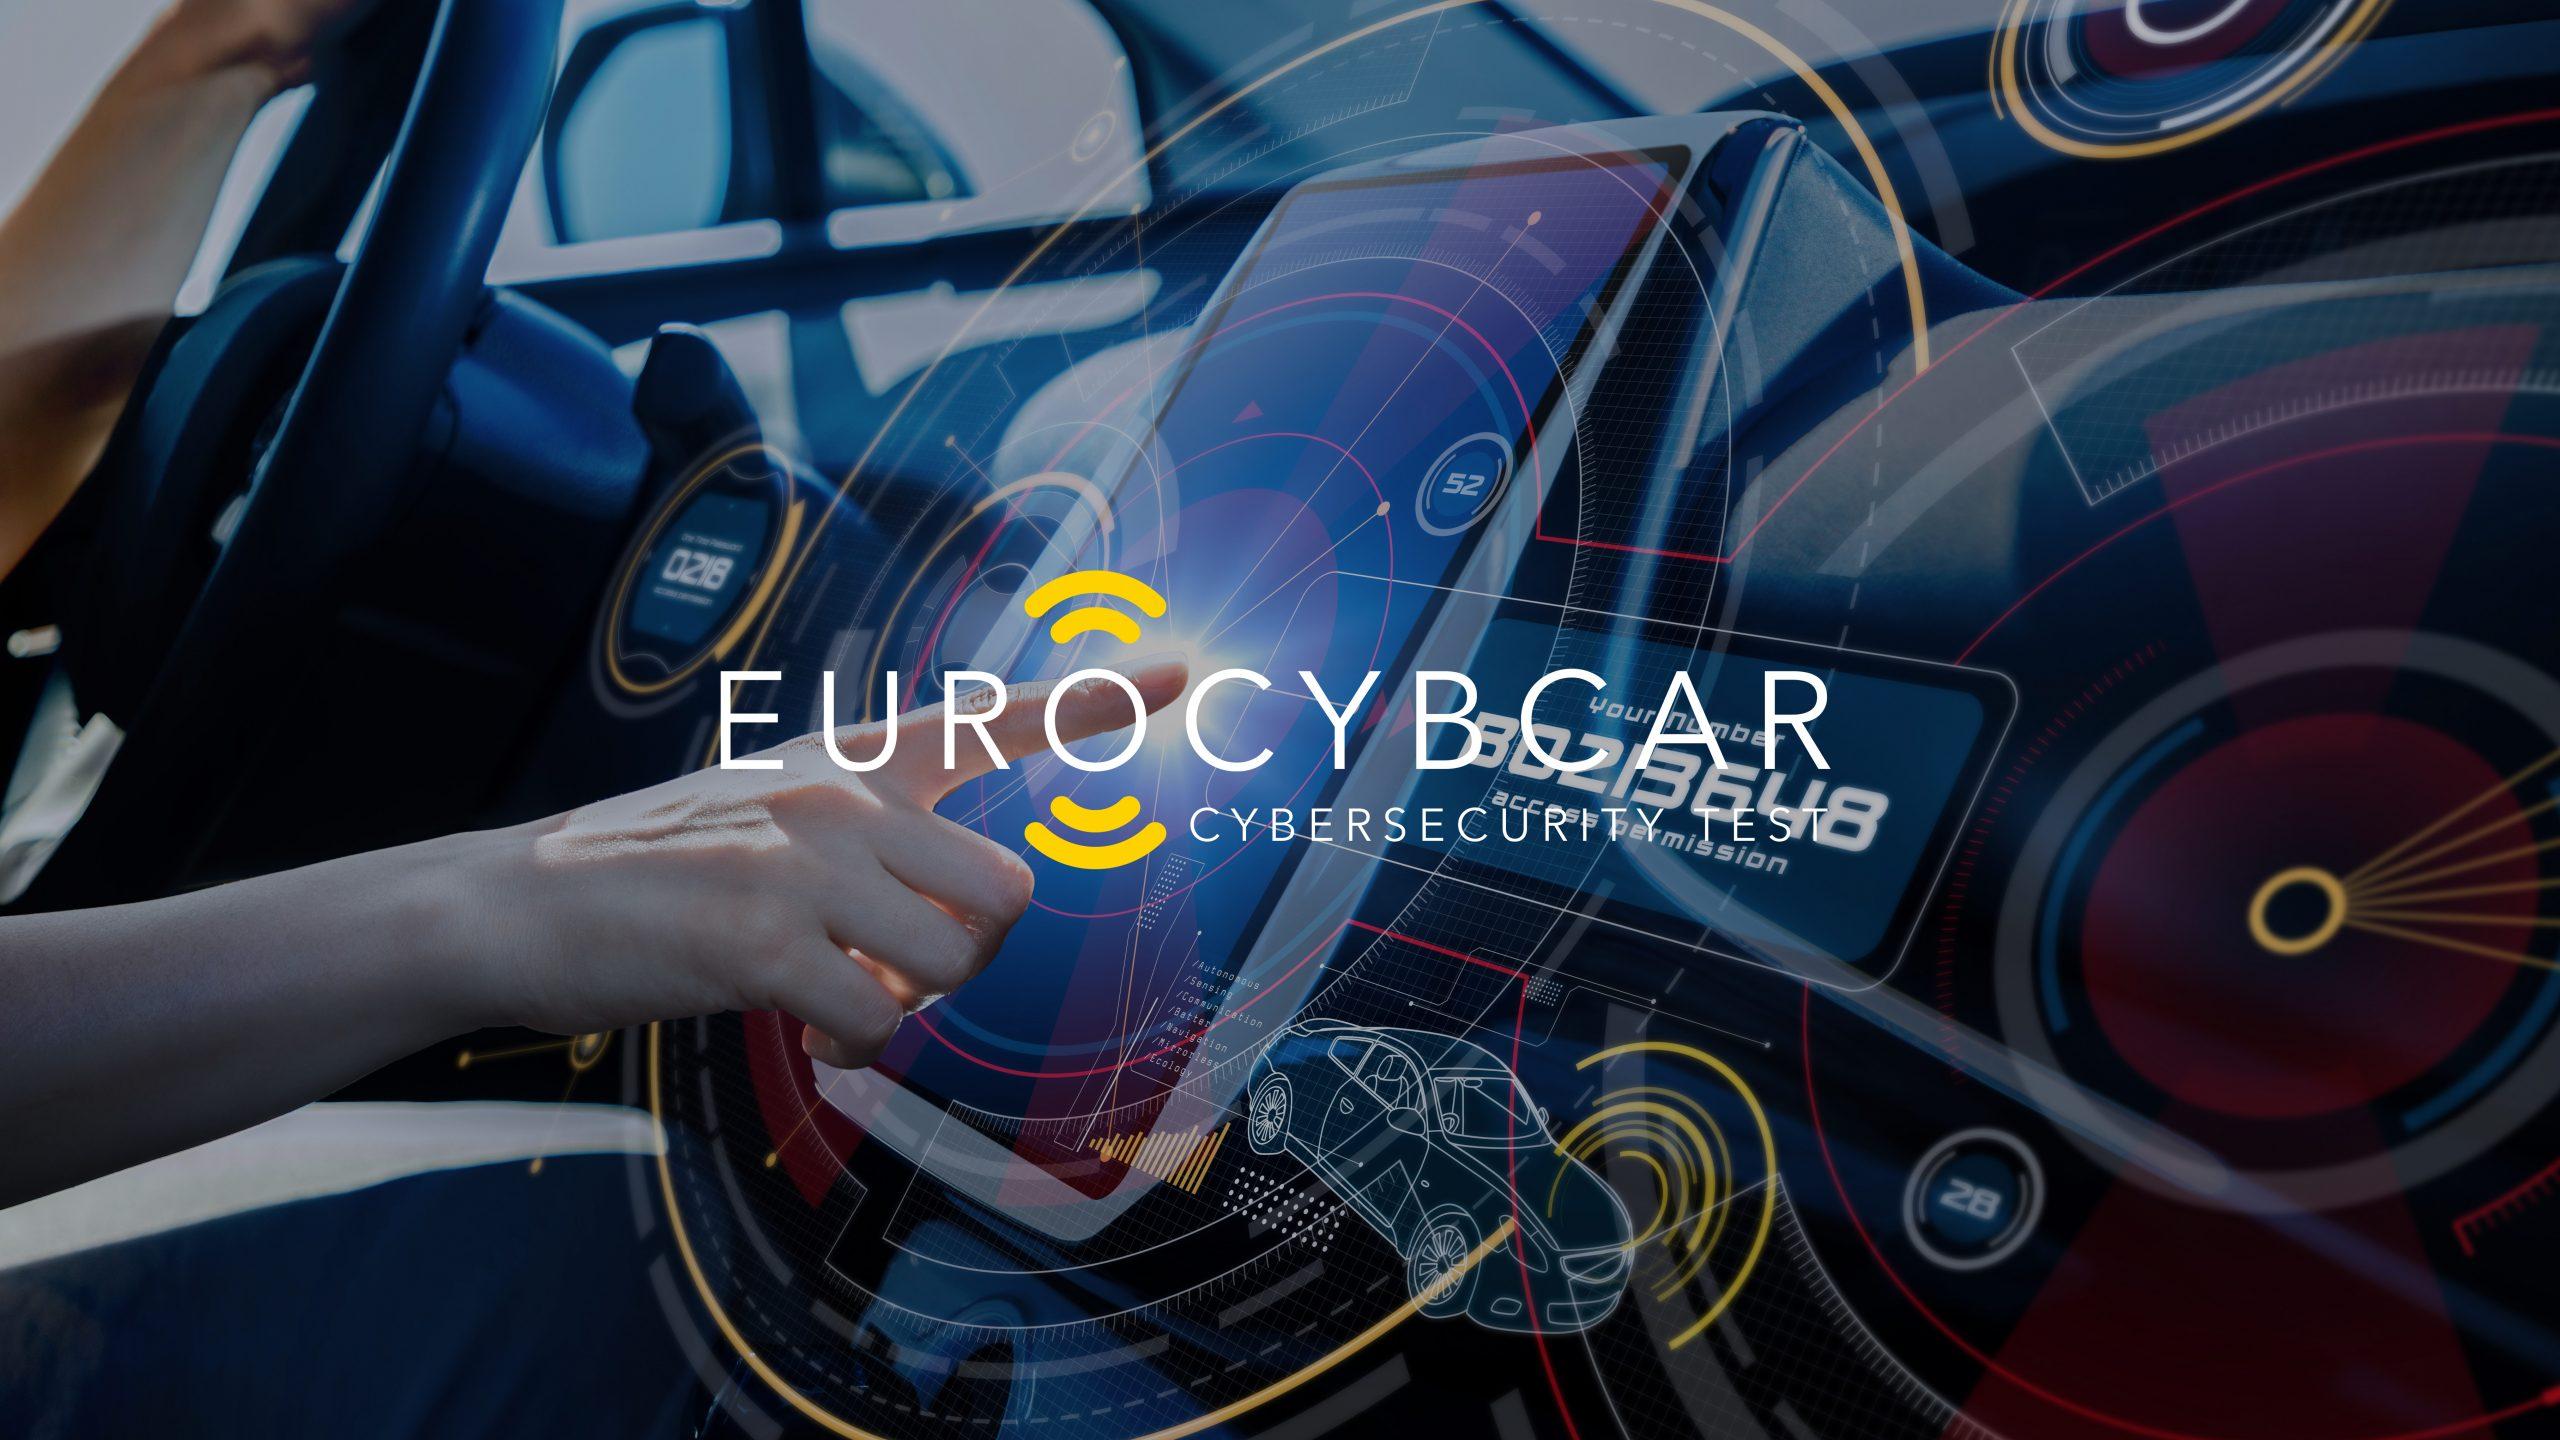 Foto Eurocybcar 3 Scaled